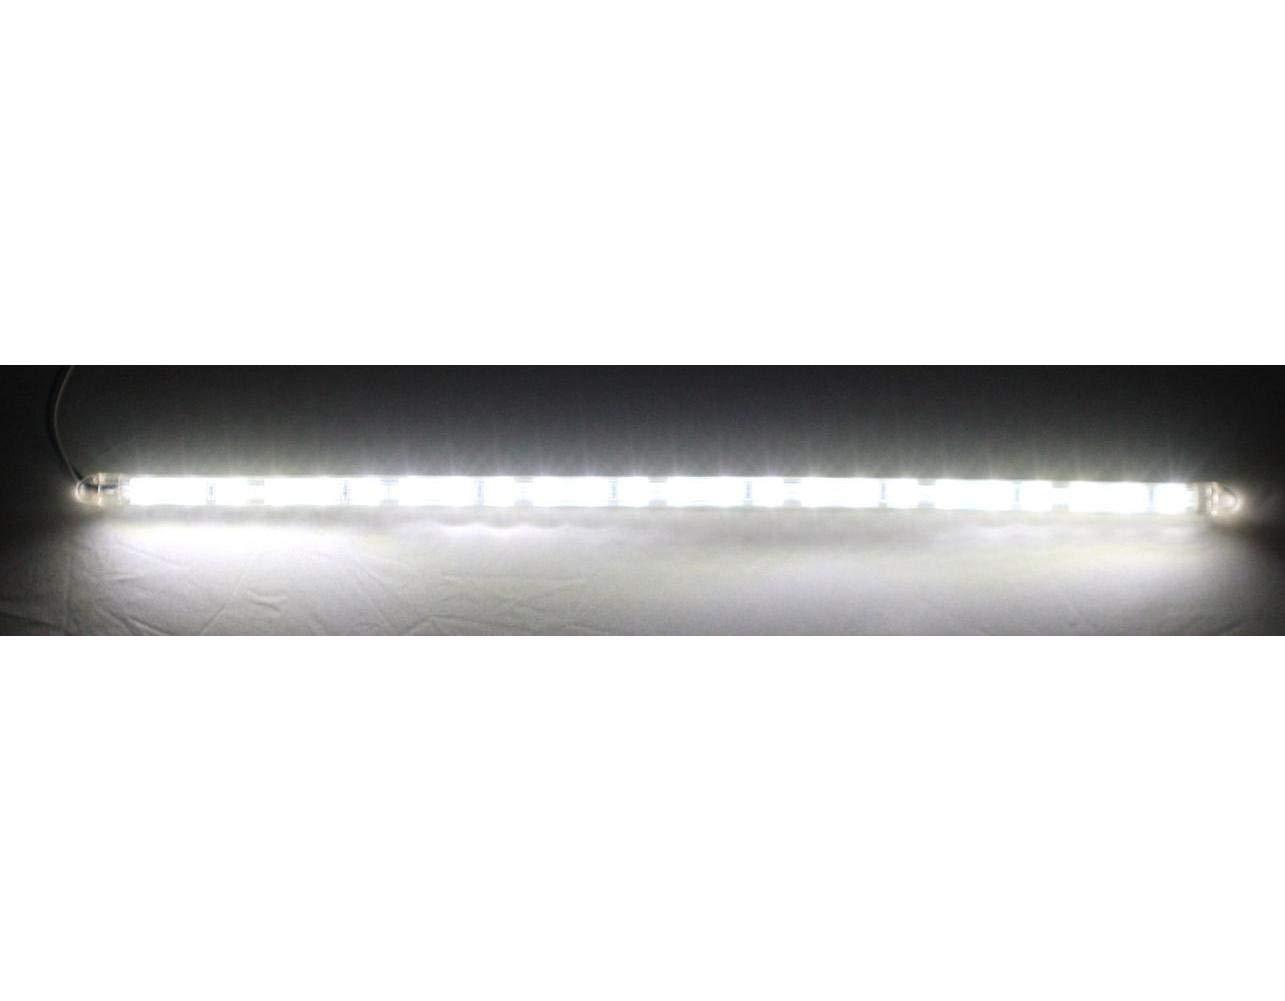 Custom Dynamics TF12WC Daytime Driving Light 6.97 Truflex LED 12-LED, 6.97 Truflex LED